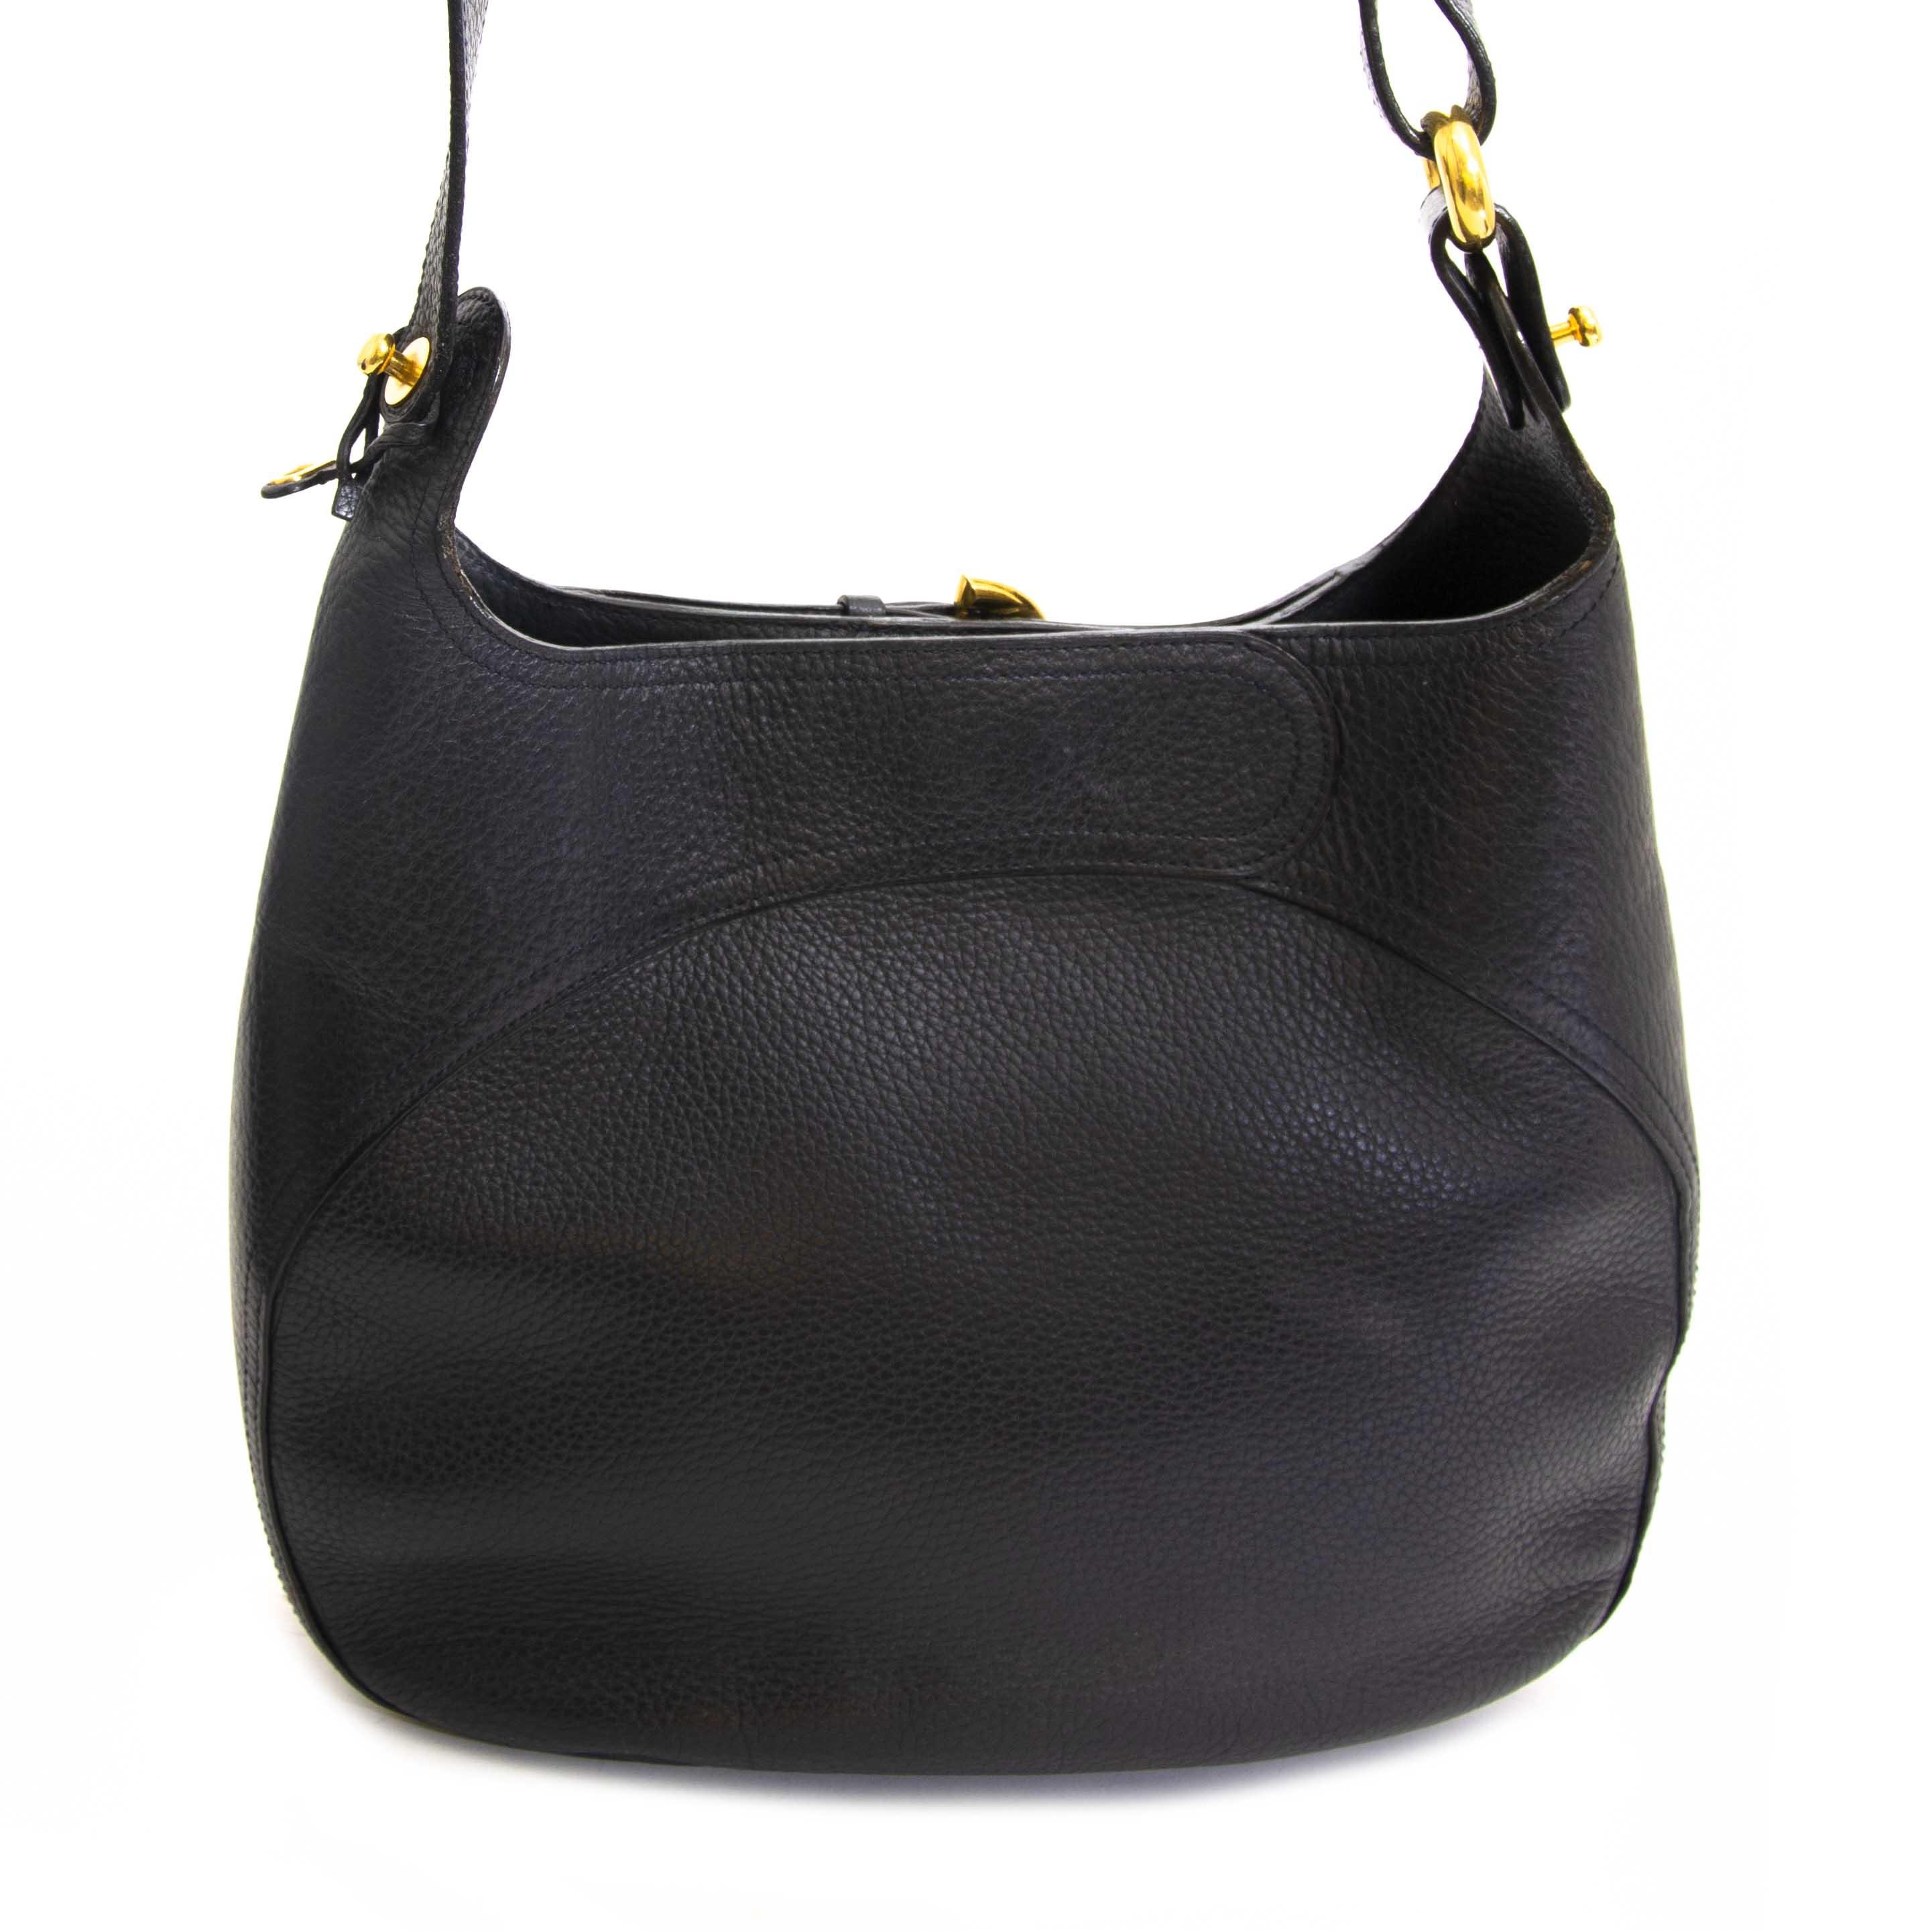 acheter en ligne seconde main Delvaux Dark Blue Leather Shoulder Bag